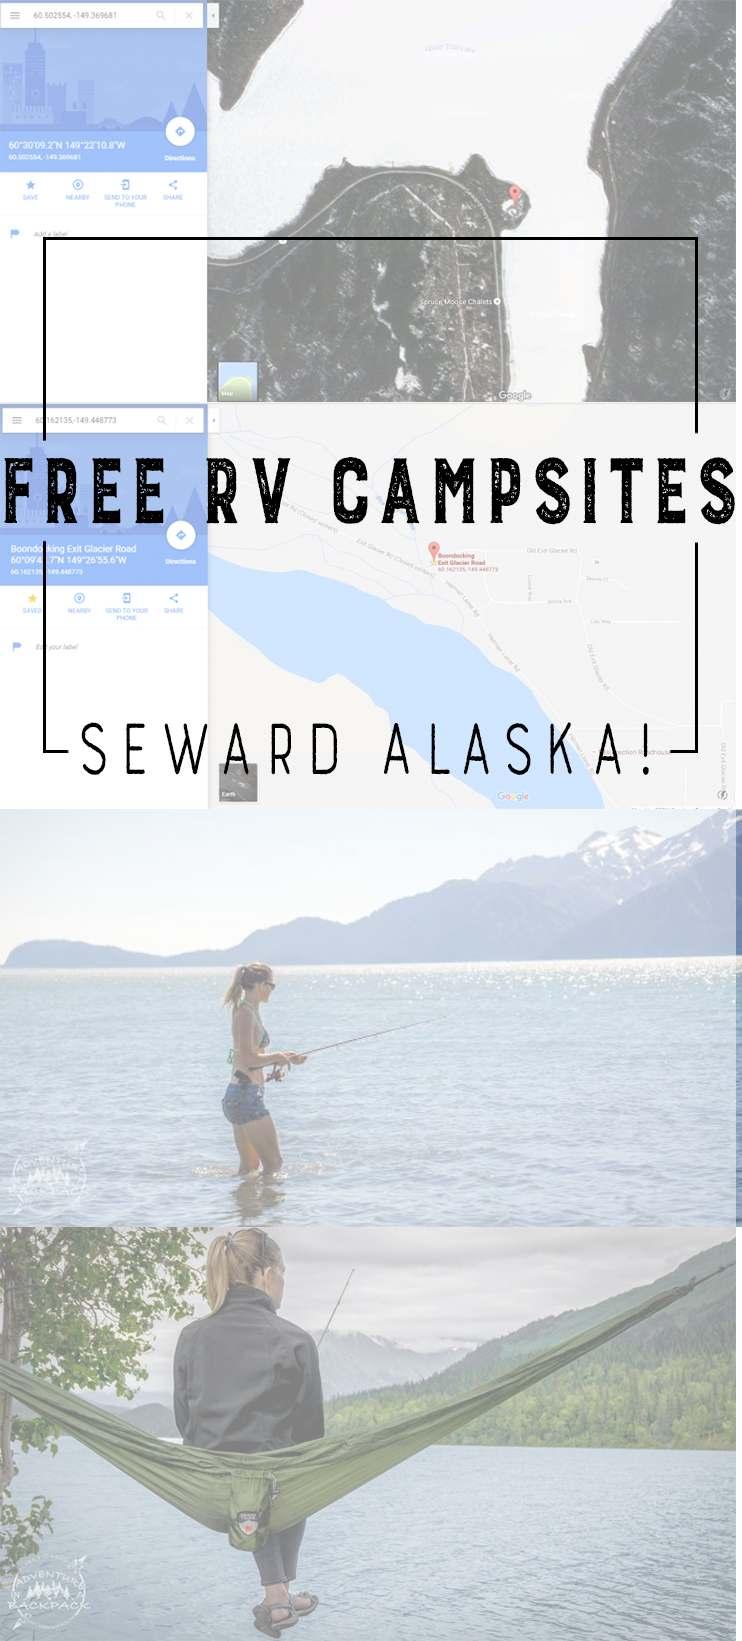 Boondocking | RV Boondocking | Free Campsites | Seward Alaska | Free places to camp in Alaska